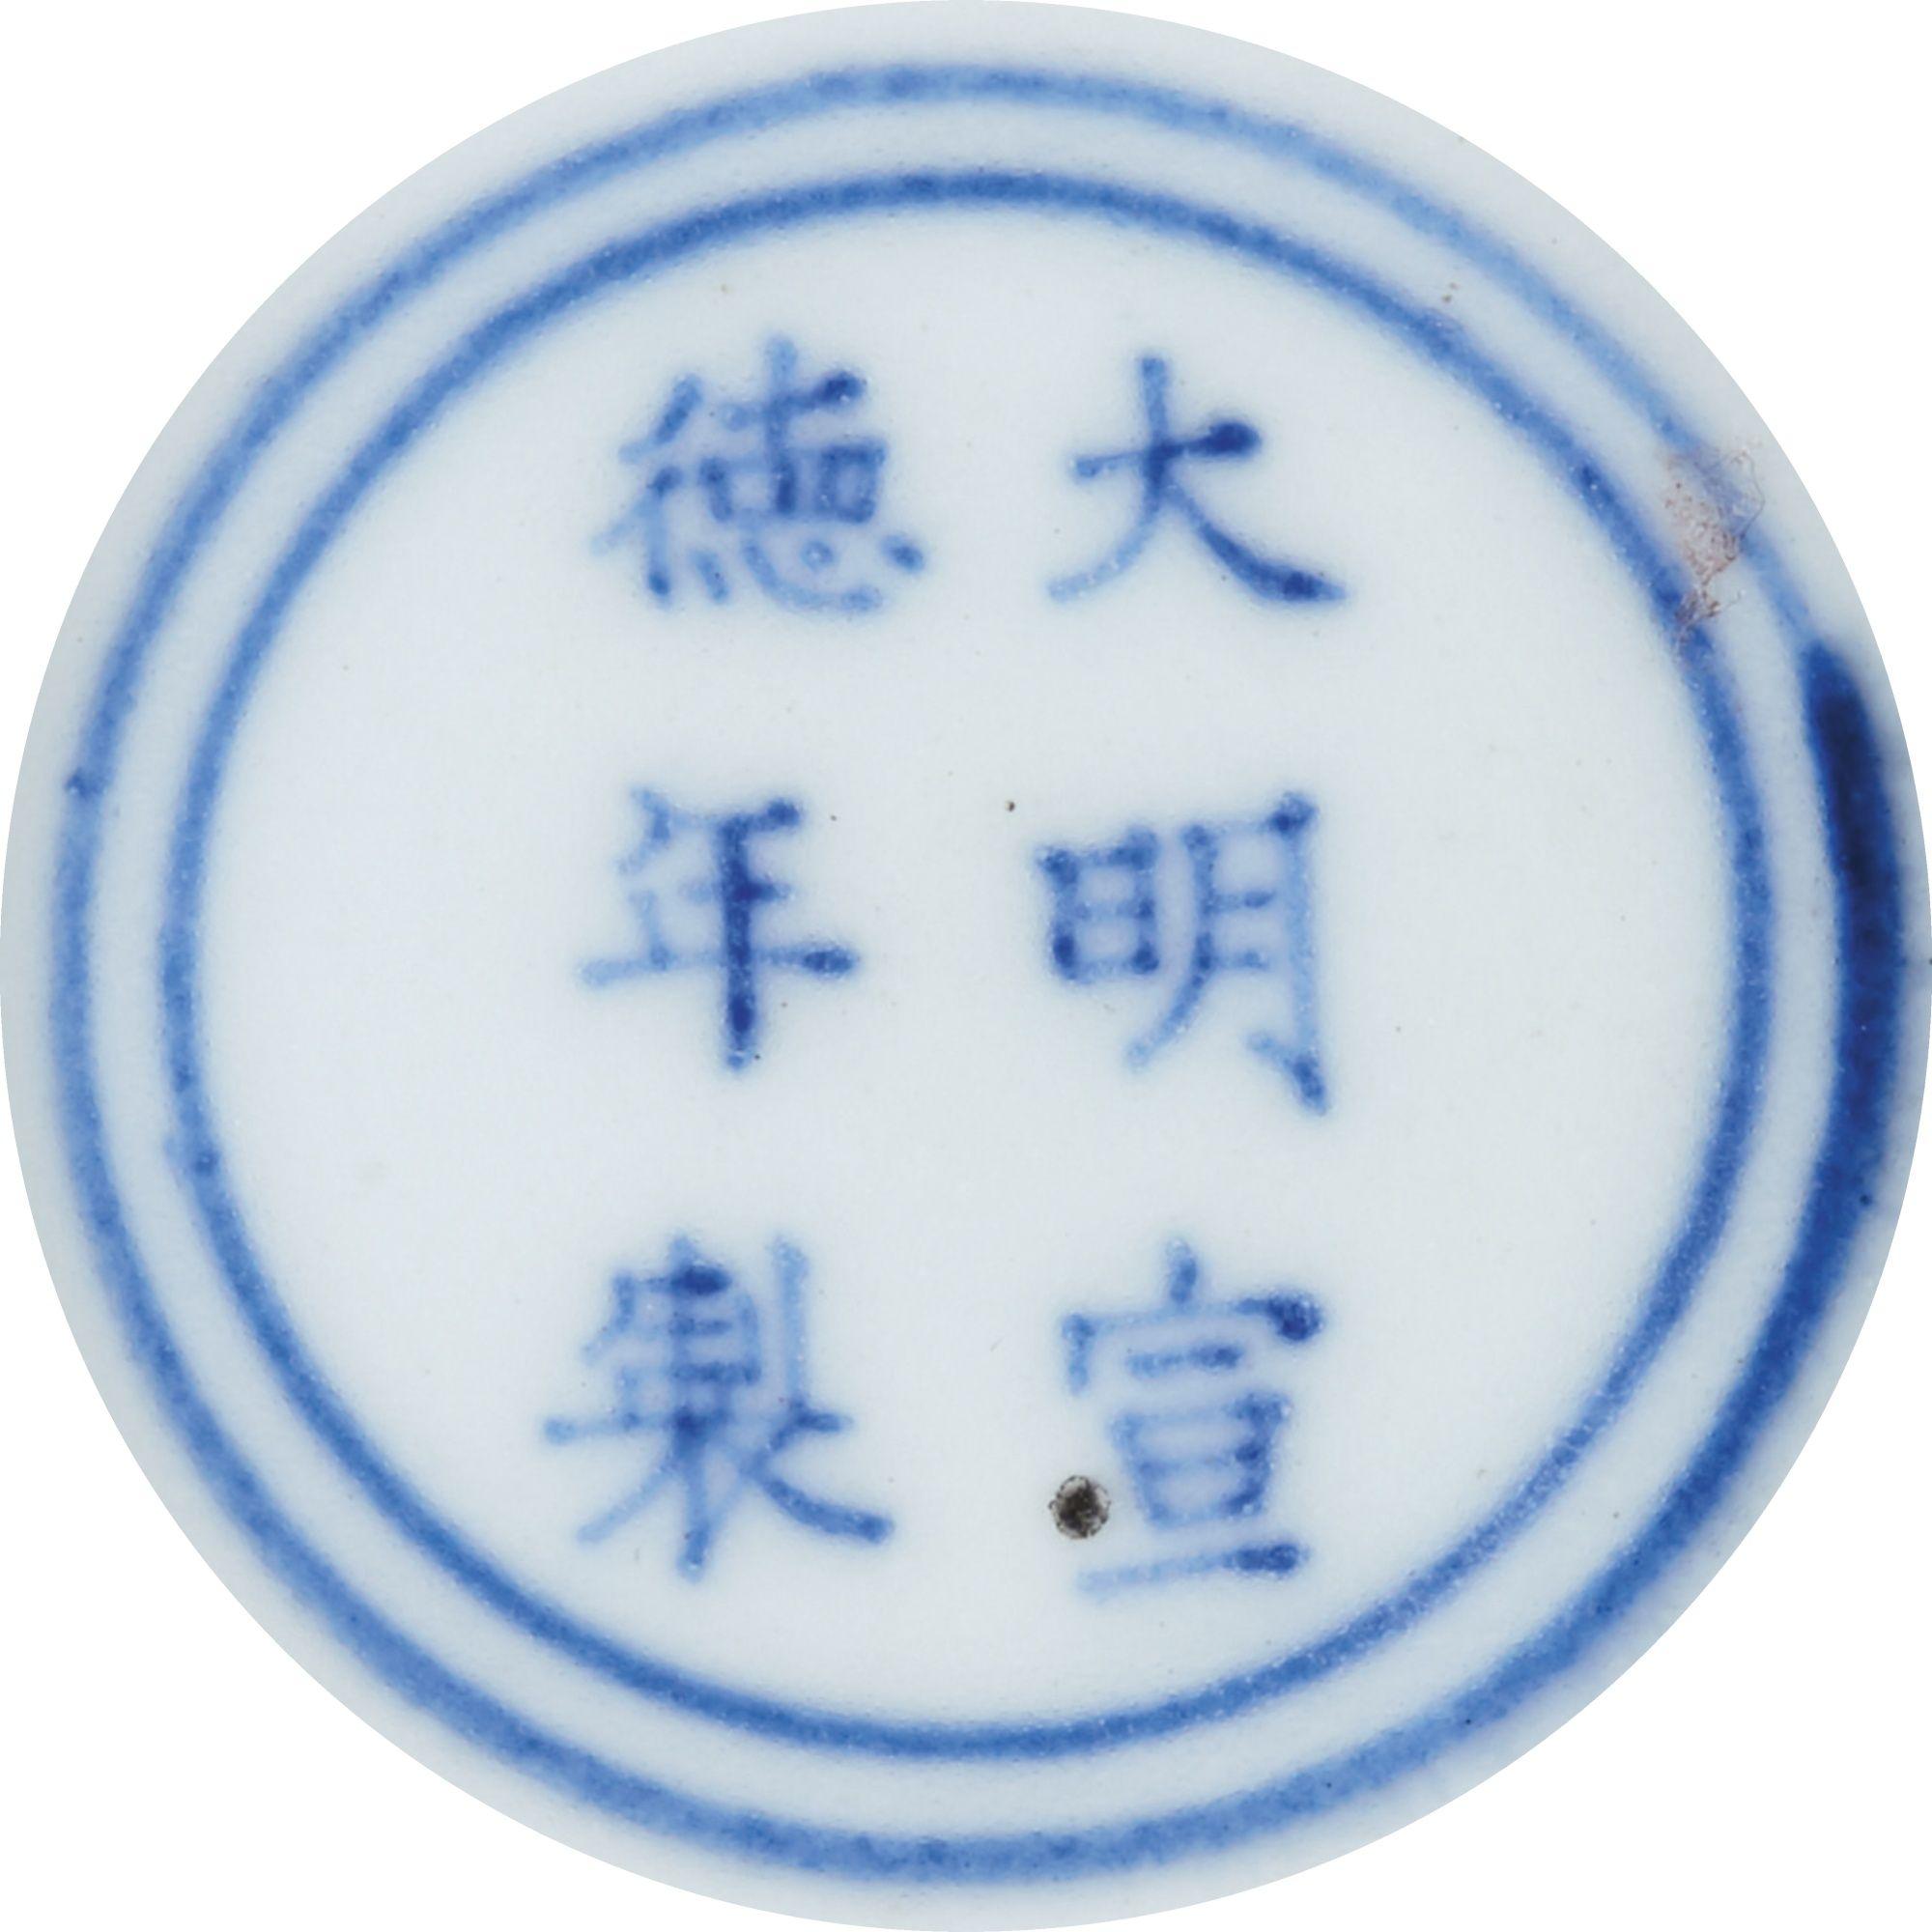 A copper red glazed vase qing dynasty 18th century xuande mark a copper red glazed vase qing dynasty 18th century xuande mark reviewsmspy